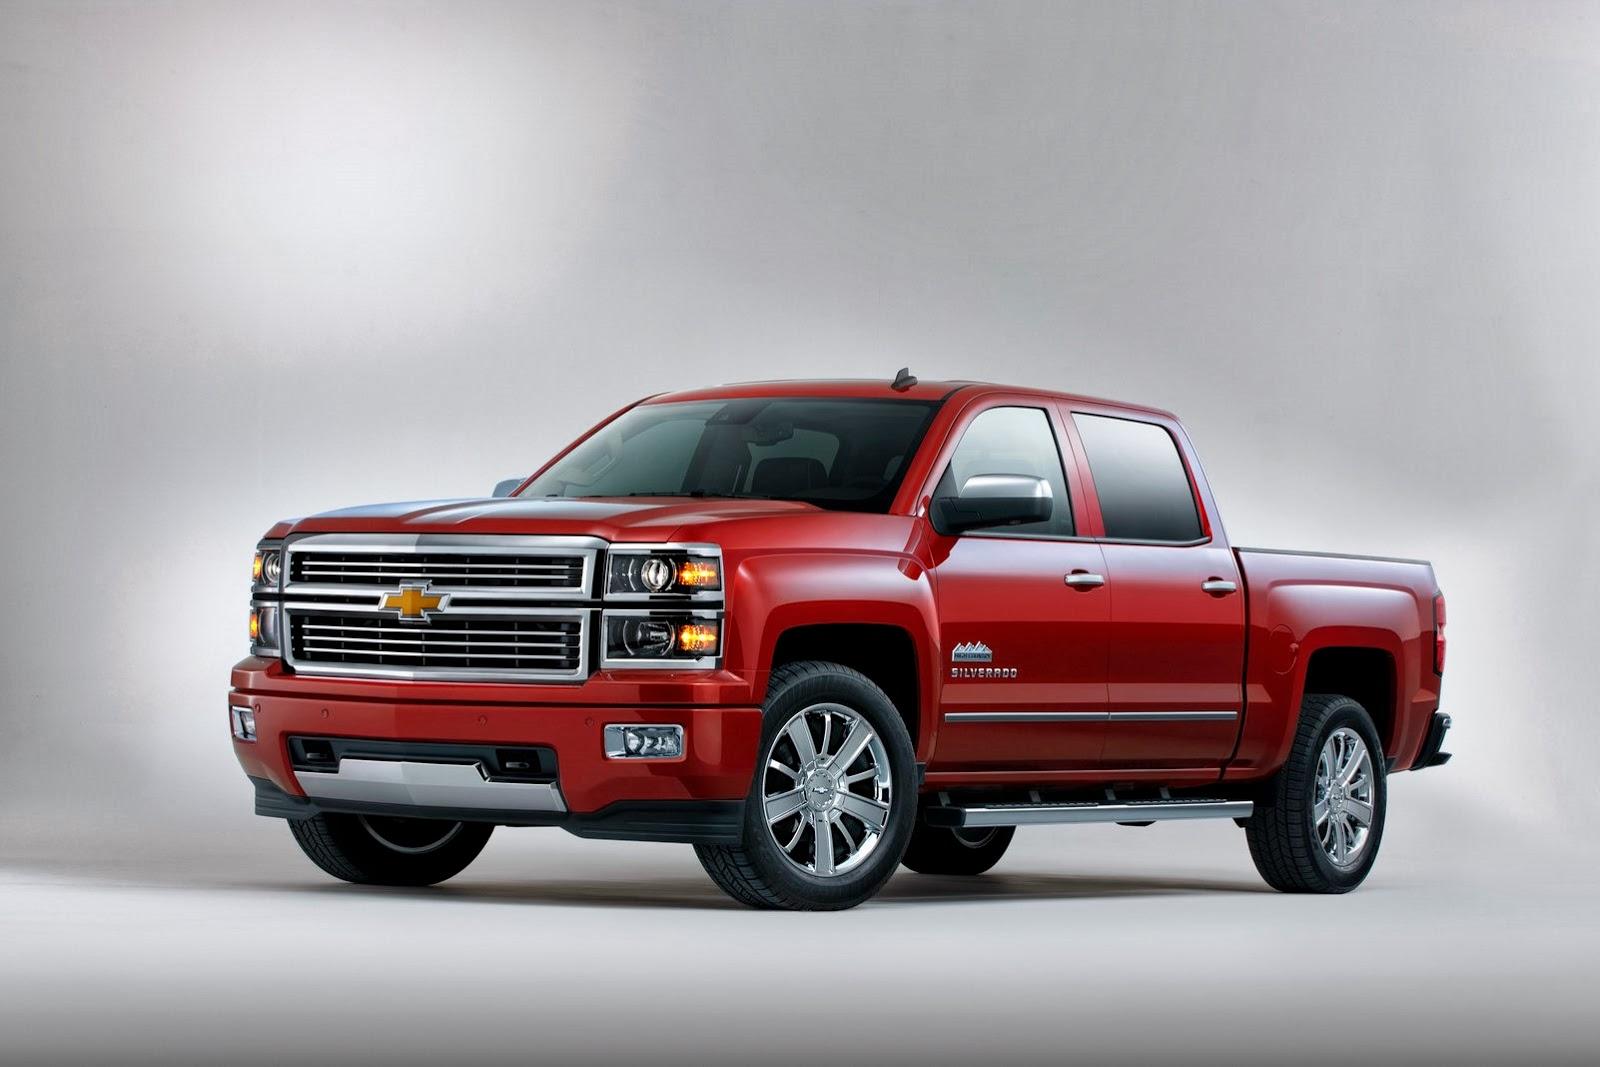 2014 Chevrolet Silverado High Country Starts at $45,100 ...